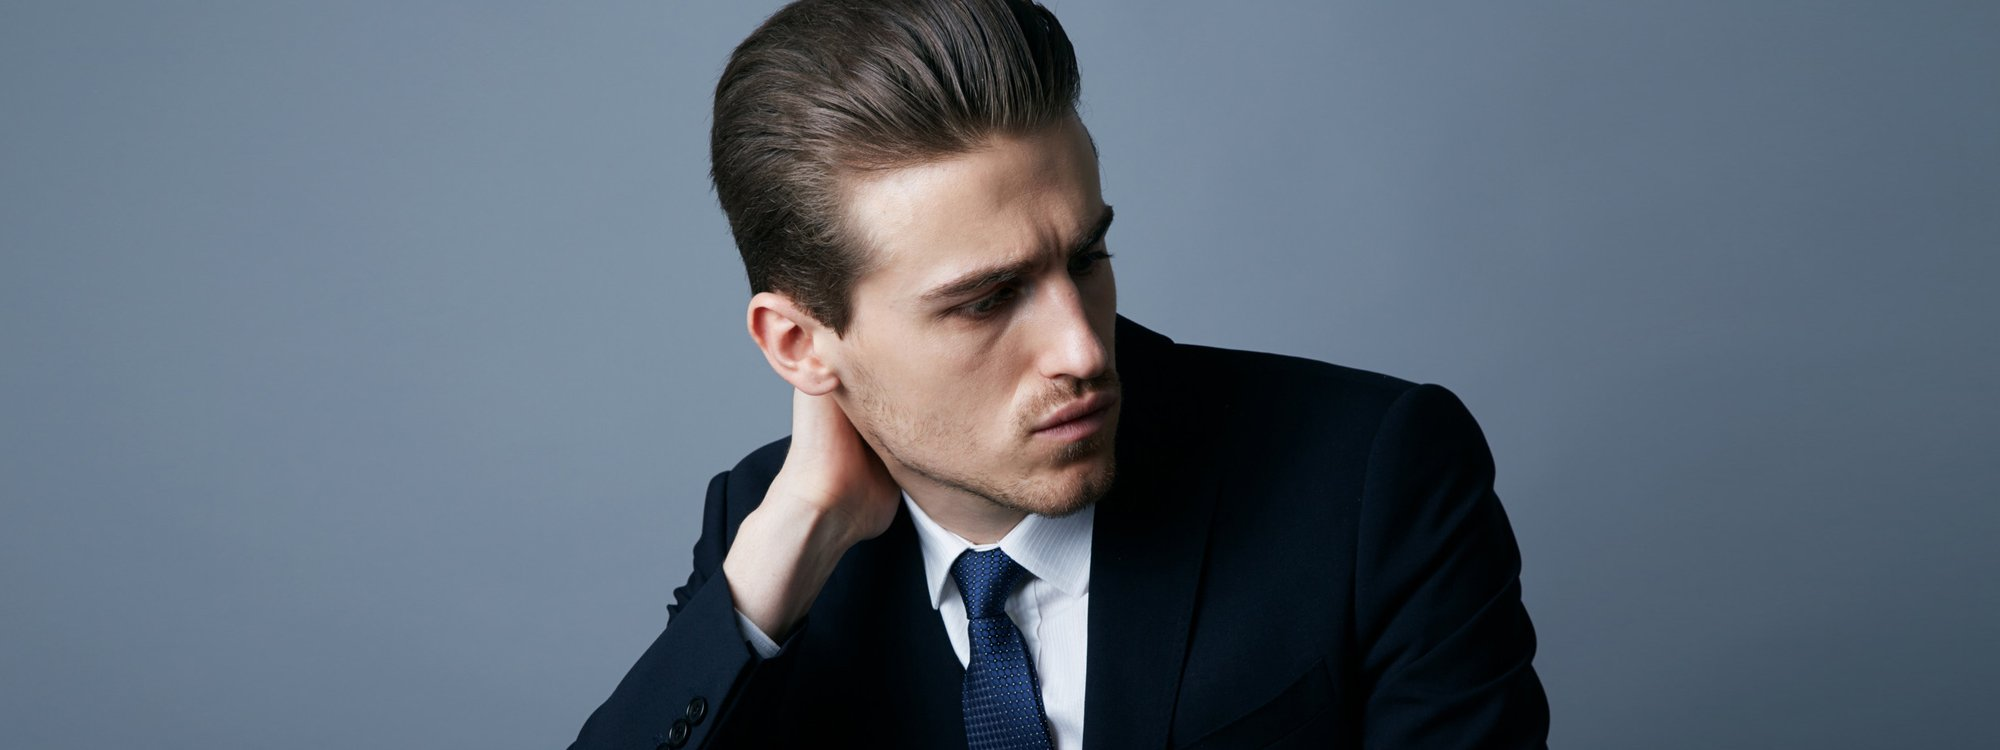 man with gelled hair